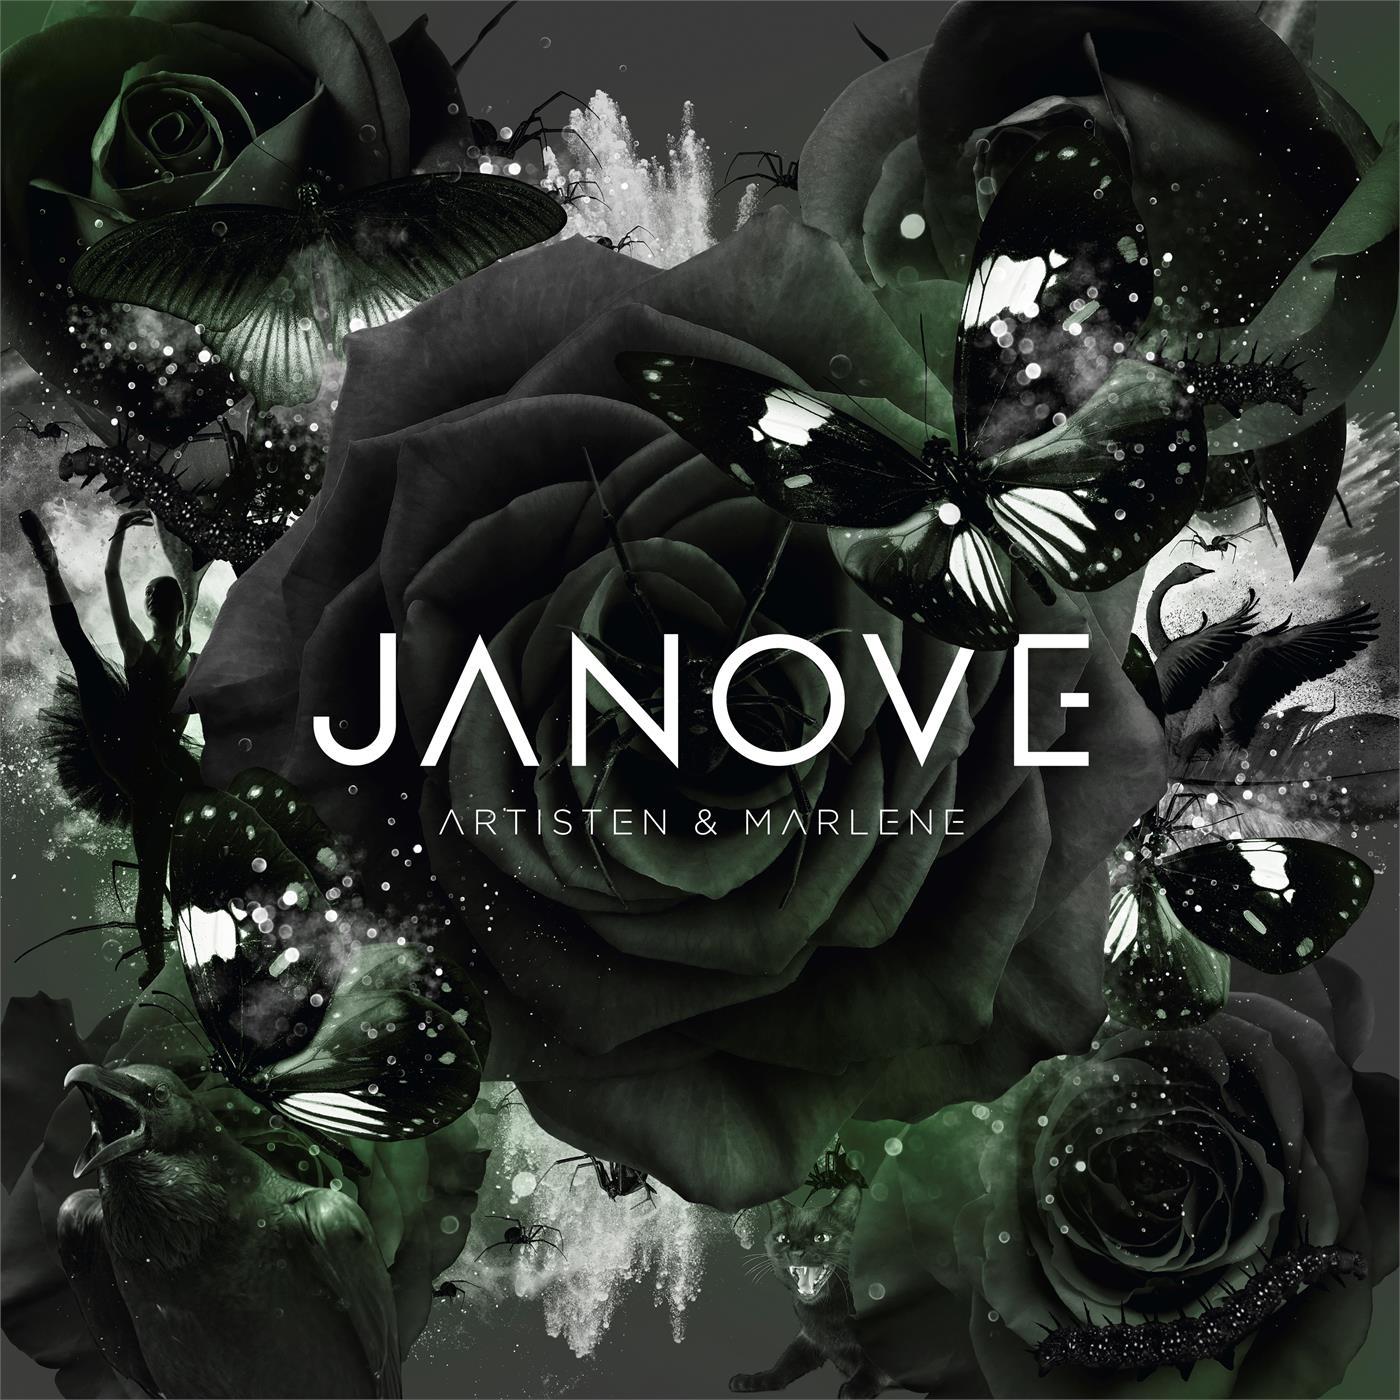 Janove - Artisten & Marlene [2xLP]